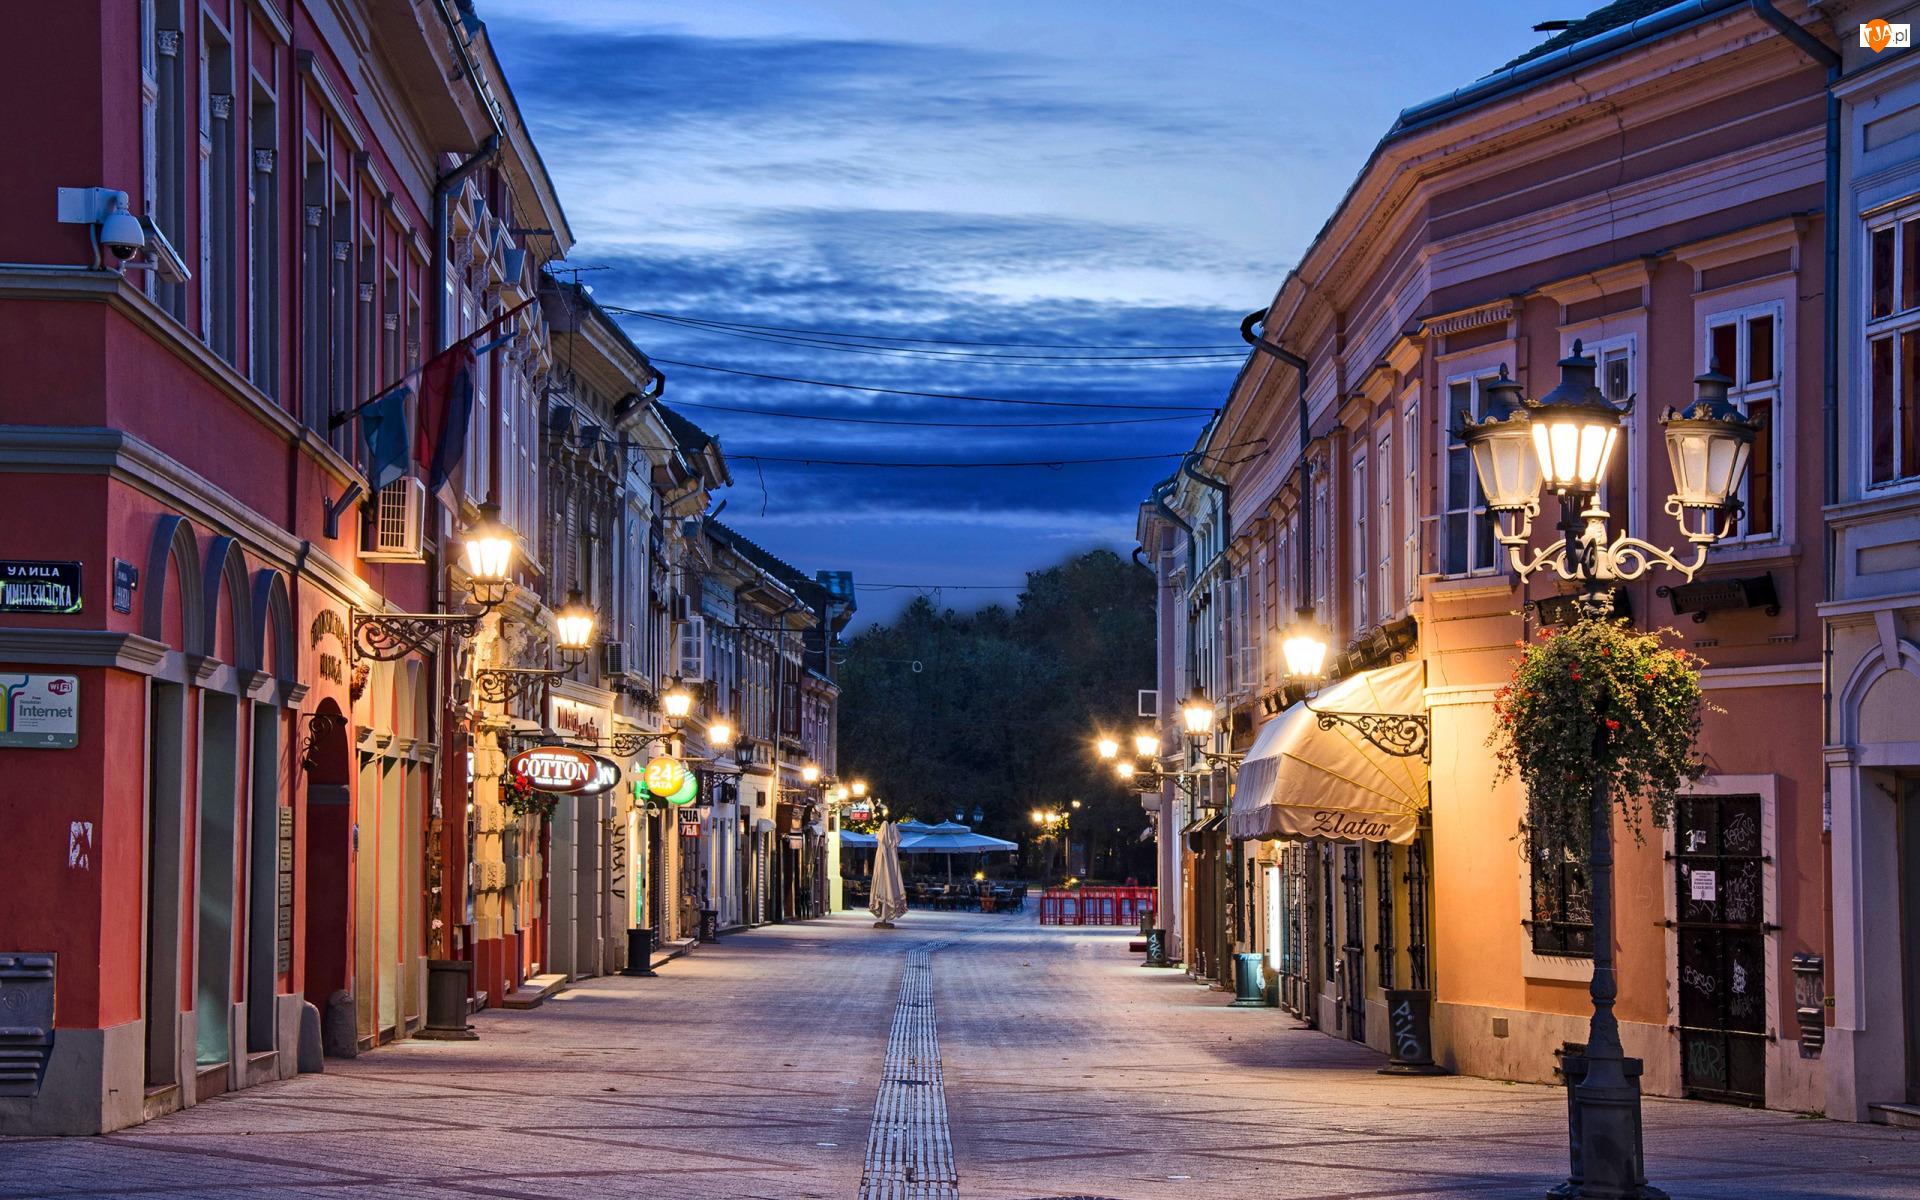 Ulica Dunavska, Latarnie, Nowy Sad, Serbia, Domy